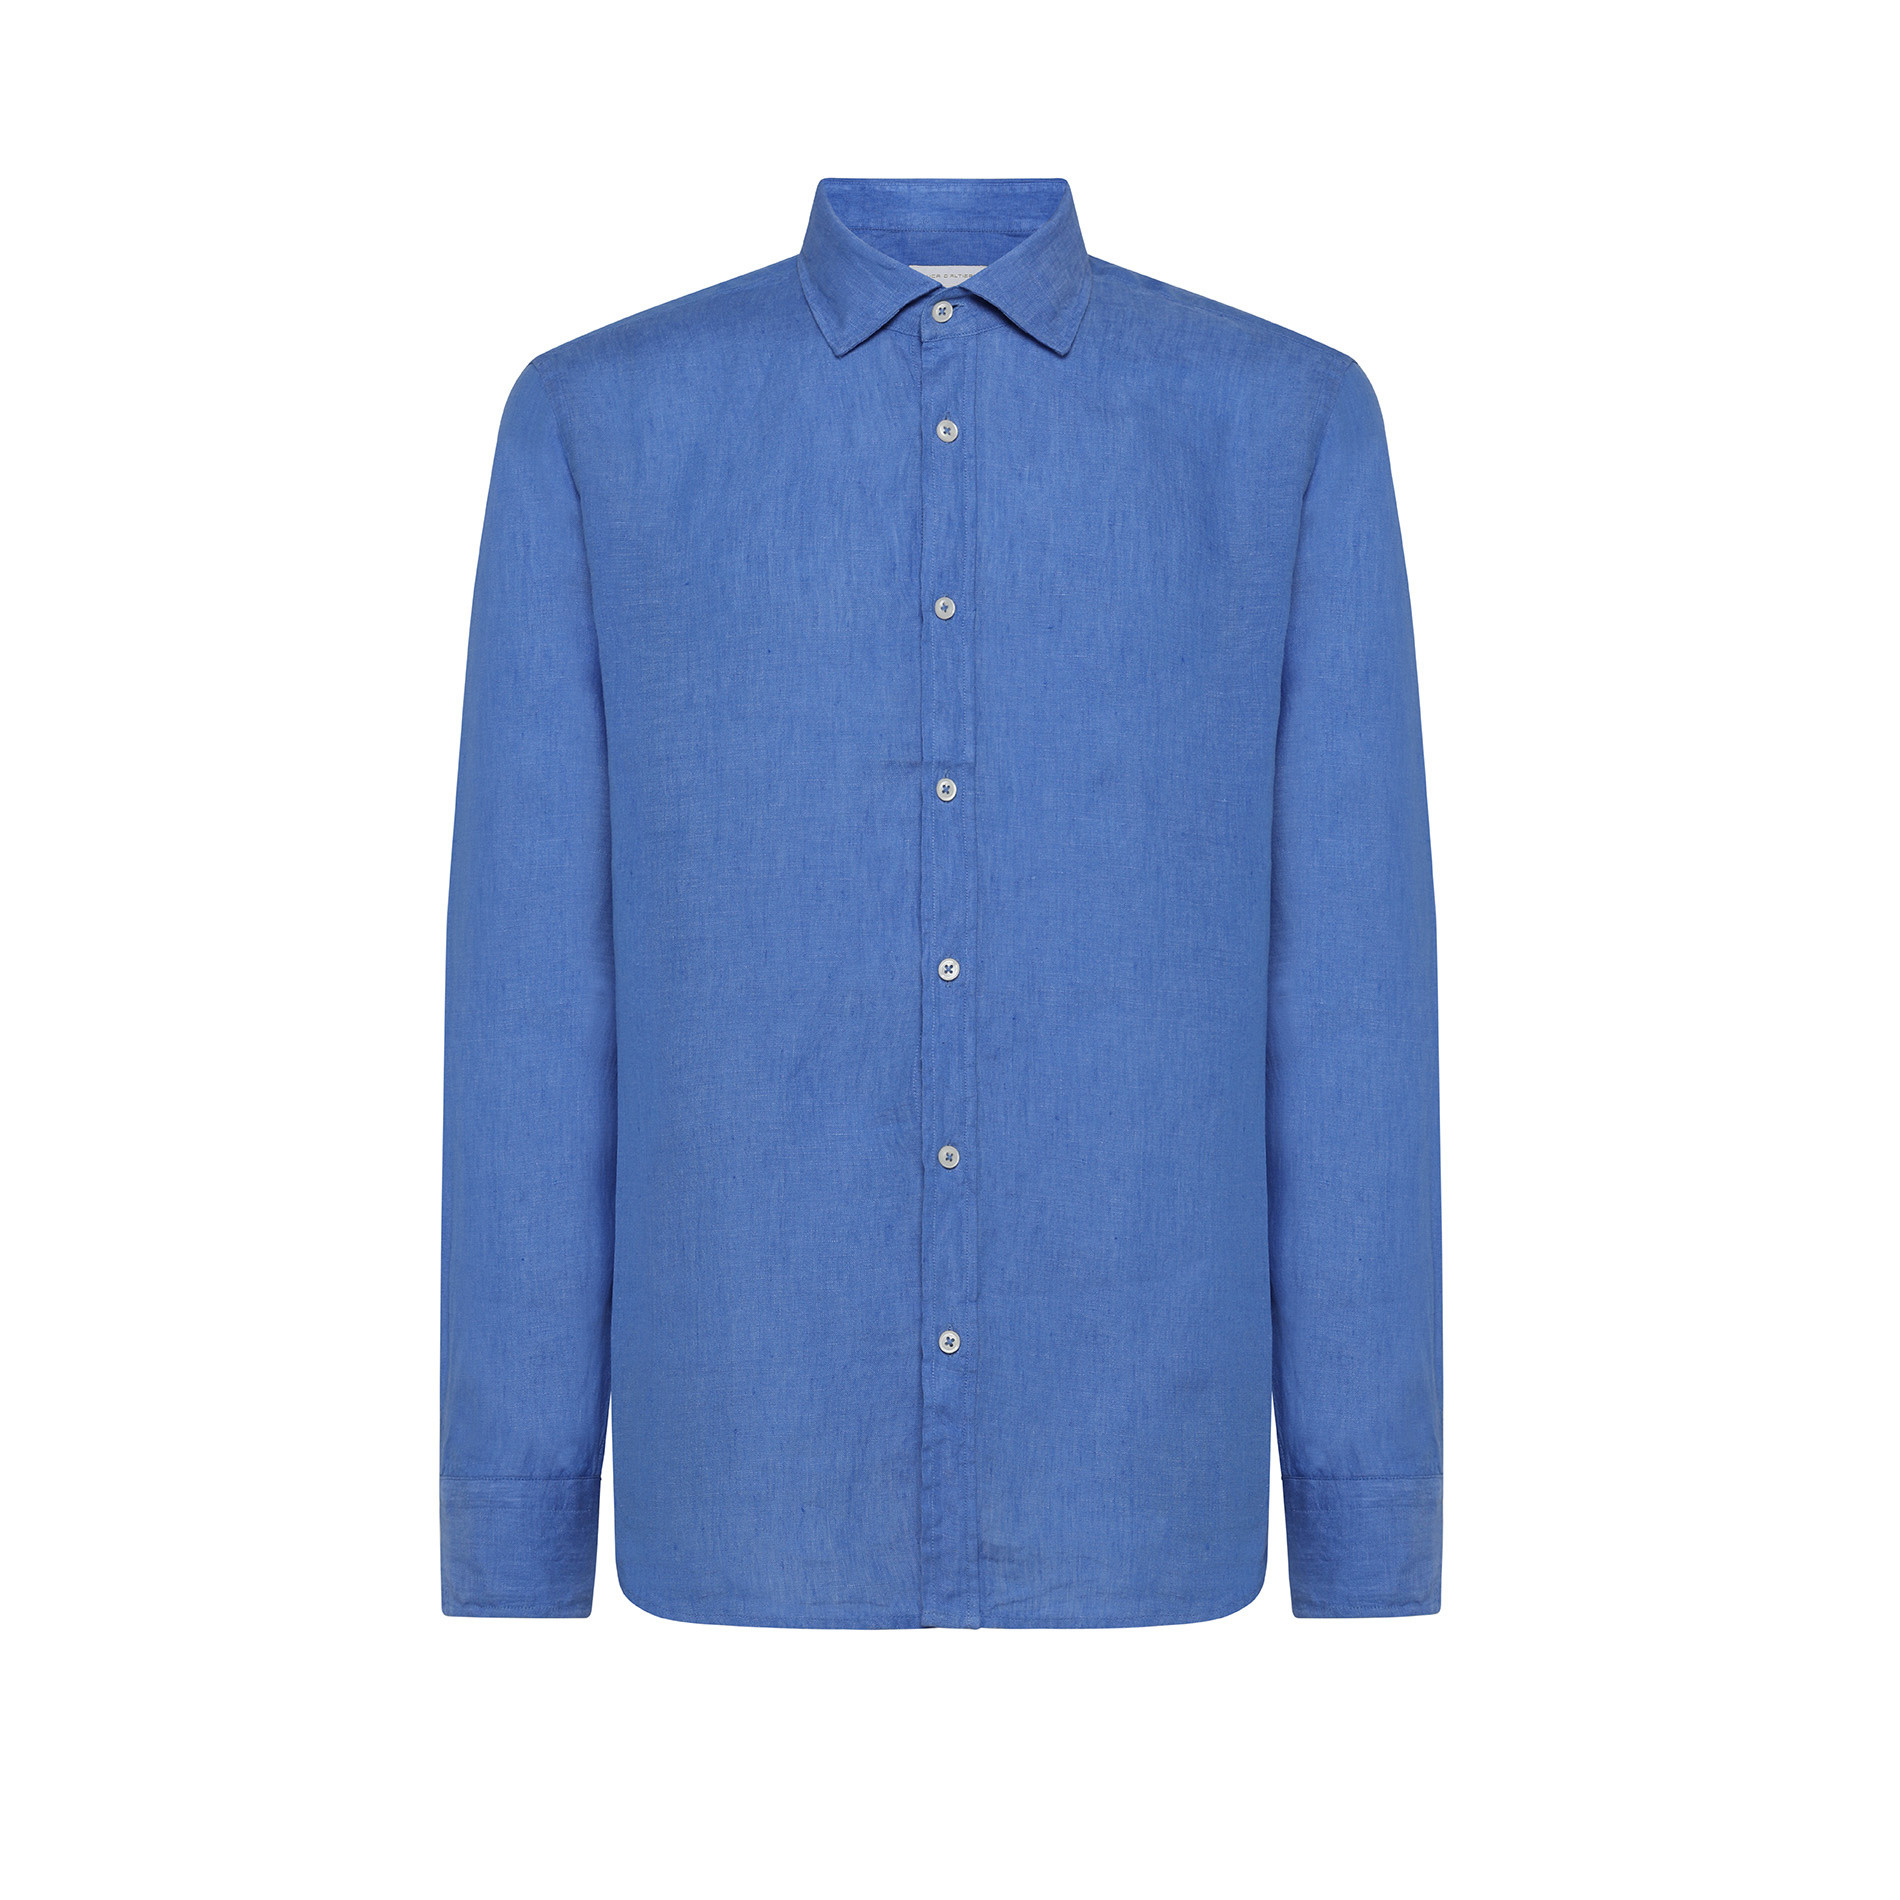 Camicia puro lino tailor fit Luca D'Altieri, Azzurro scuro, large image number 0